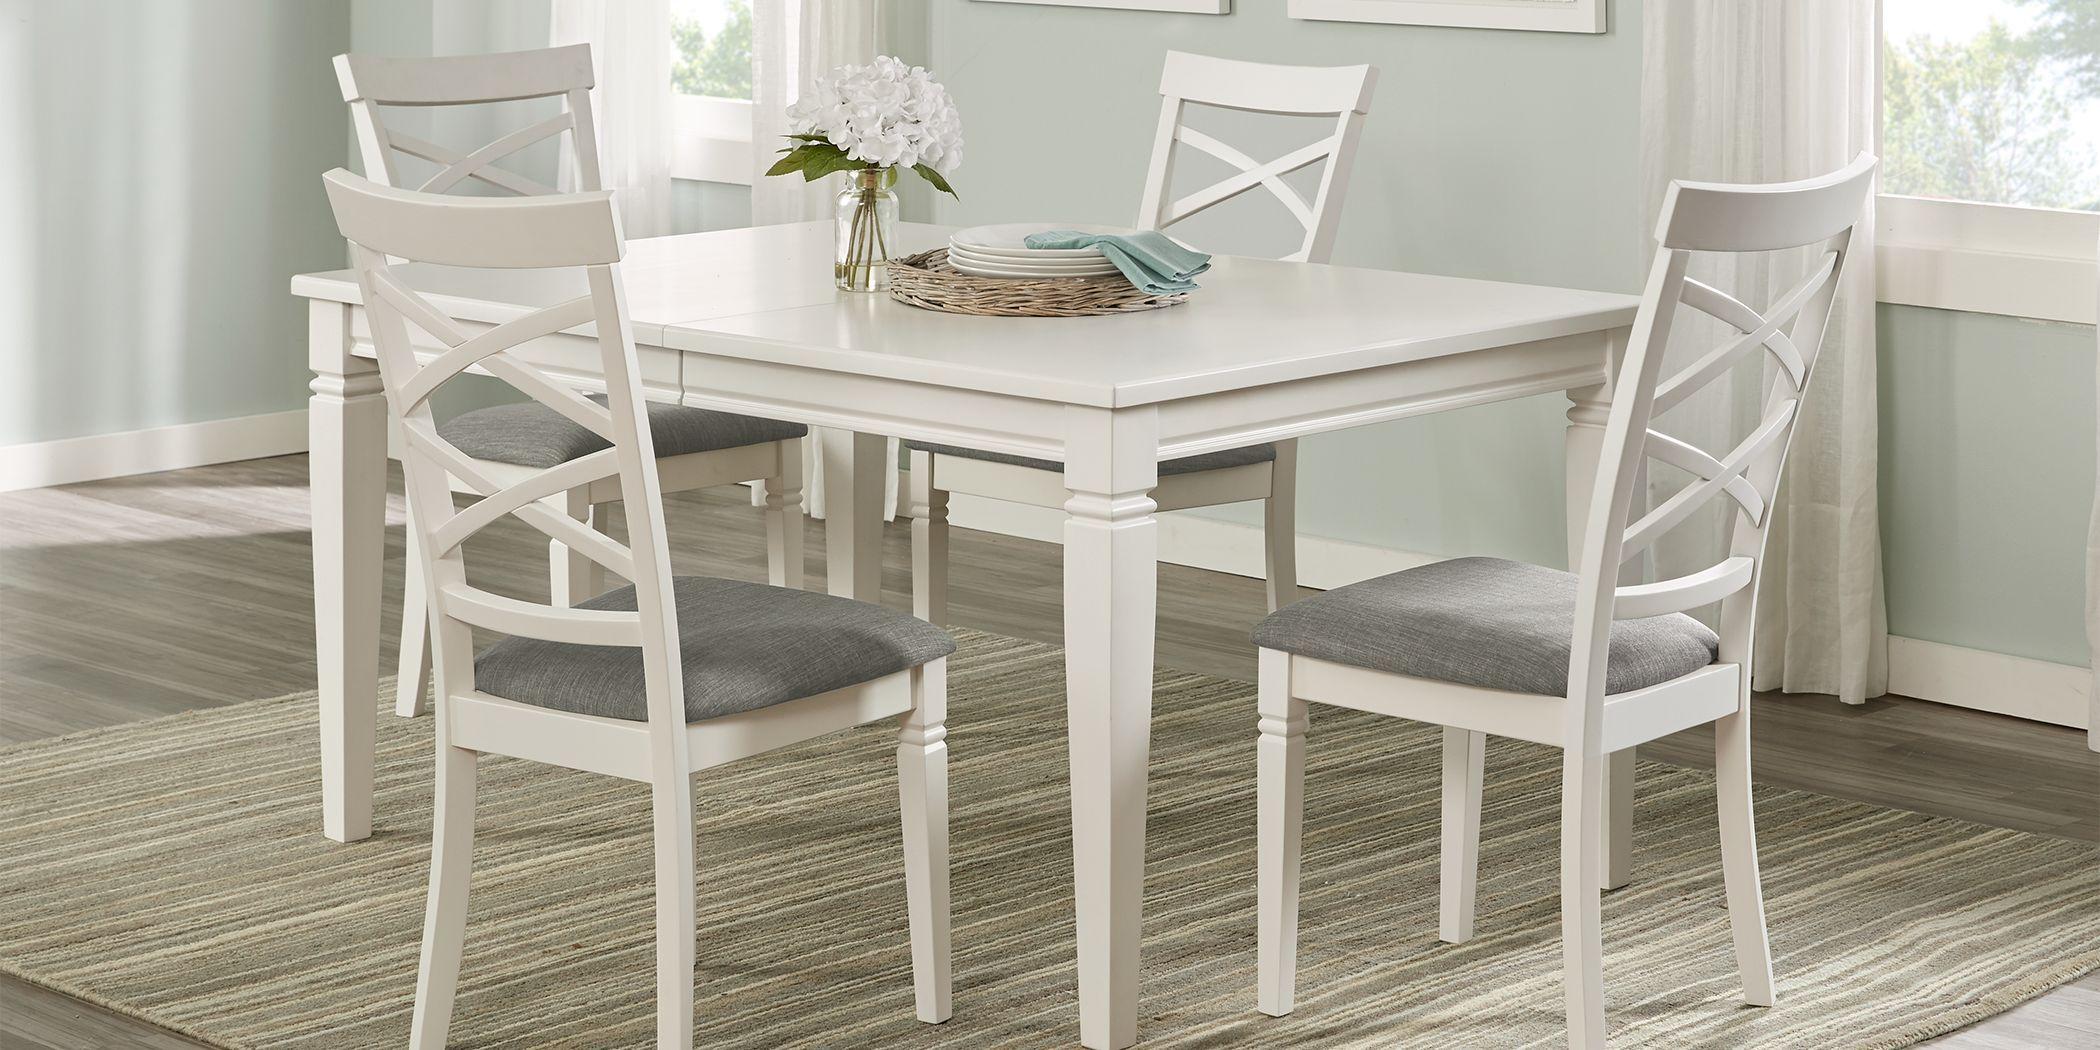 Rooms To Go White Kitchen Table